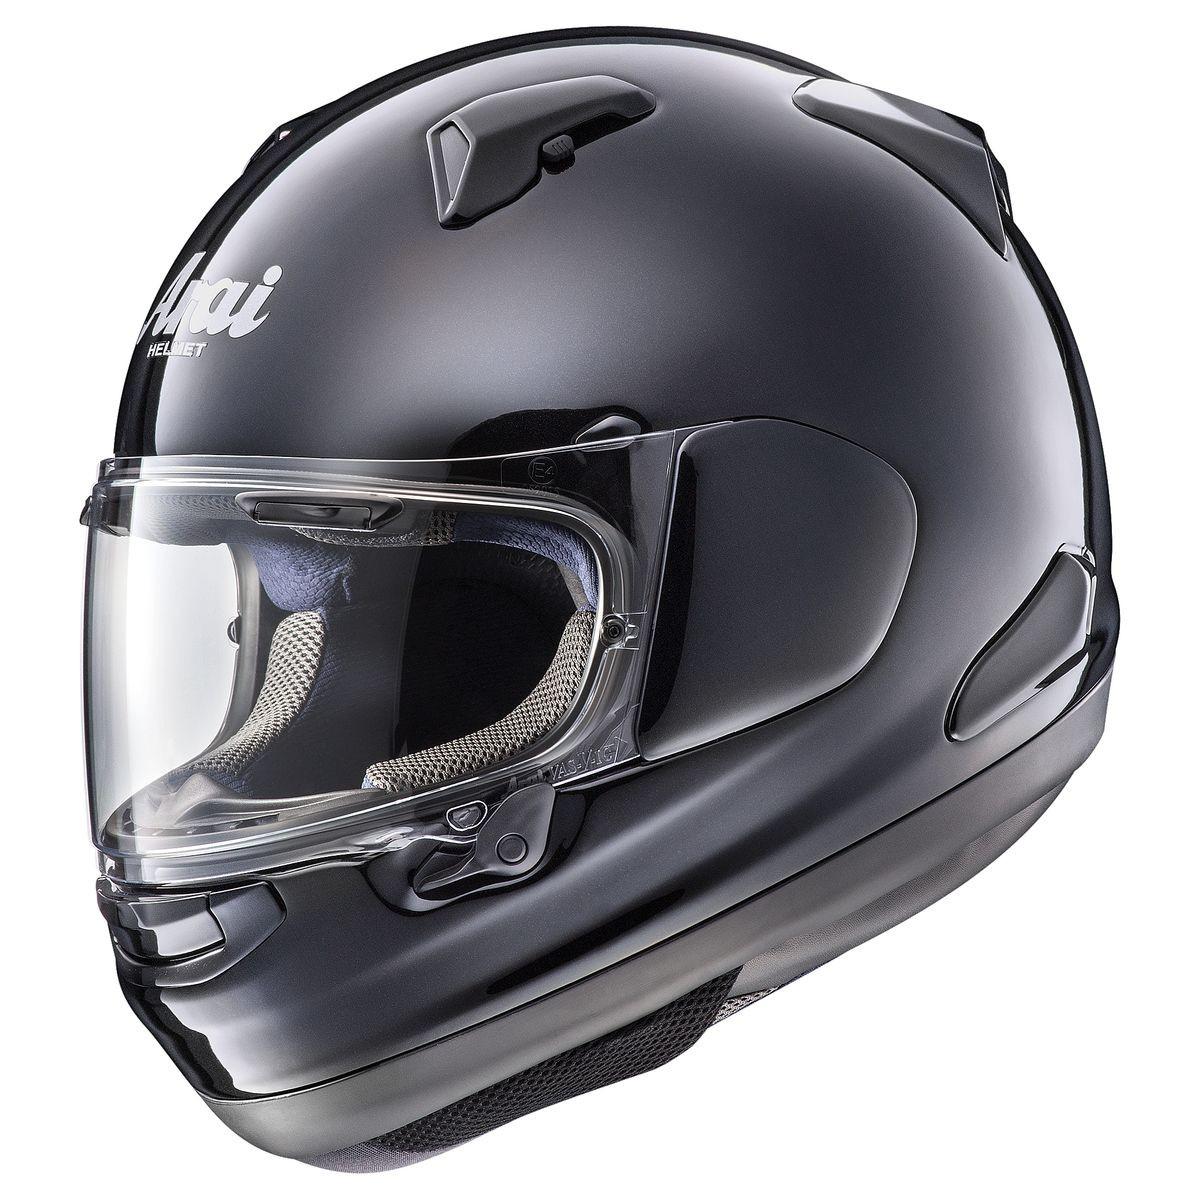 56704948 Arai Signet-X Helmet - Motorcycle House